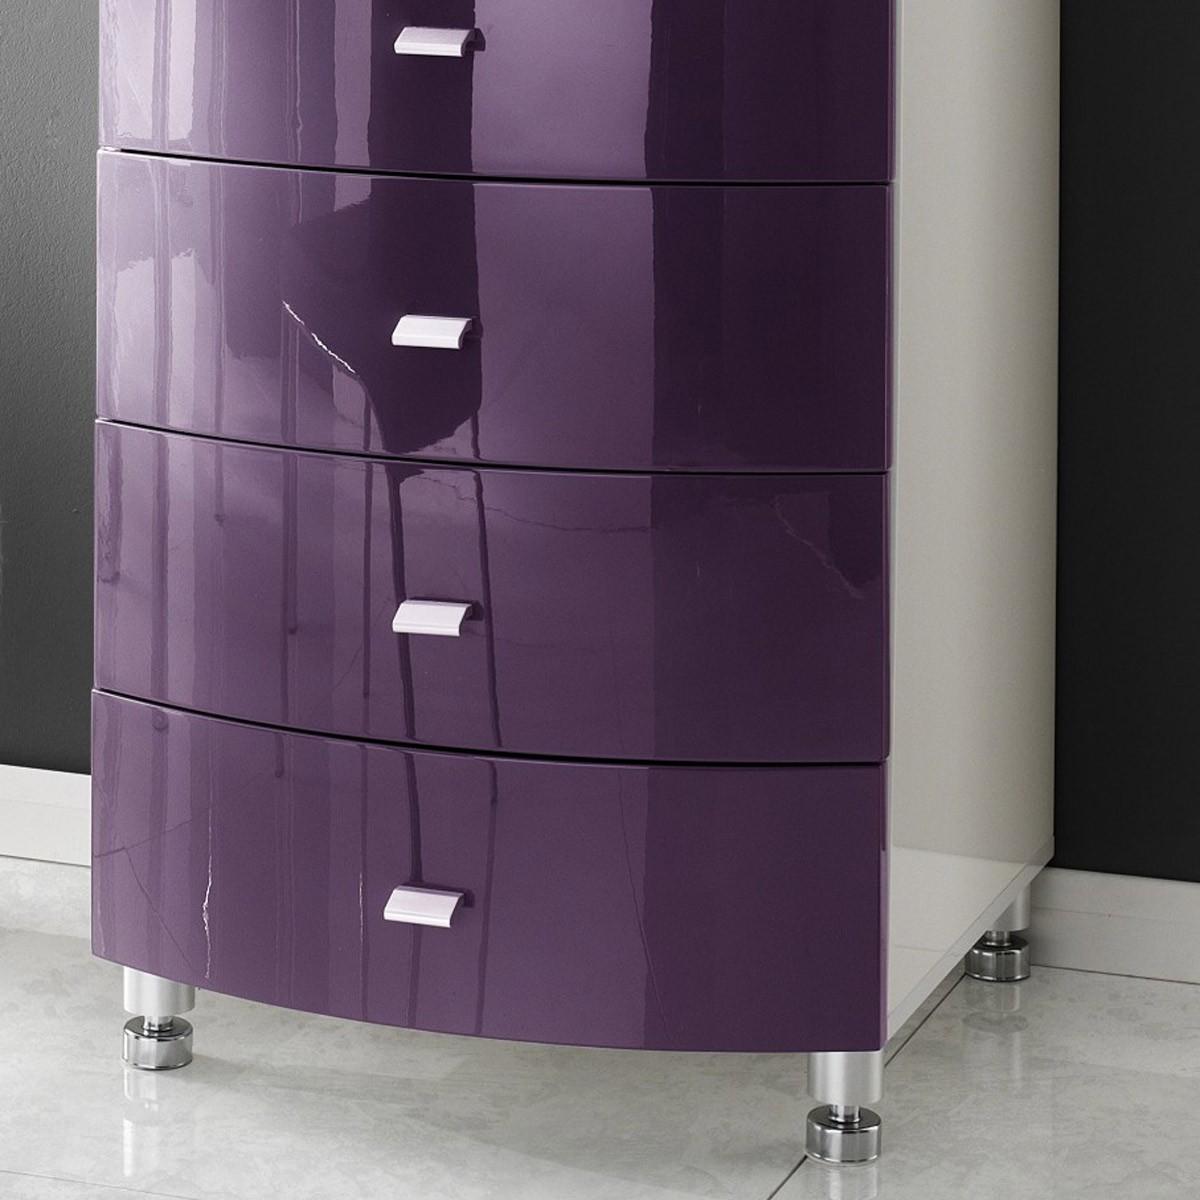 kommode lucio in hochglanz purple lila und wei. Black Bedroom Furniture Sets. Home Design Ideas